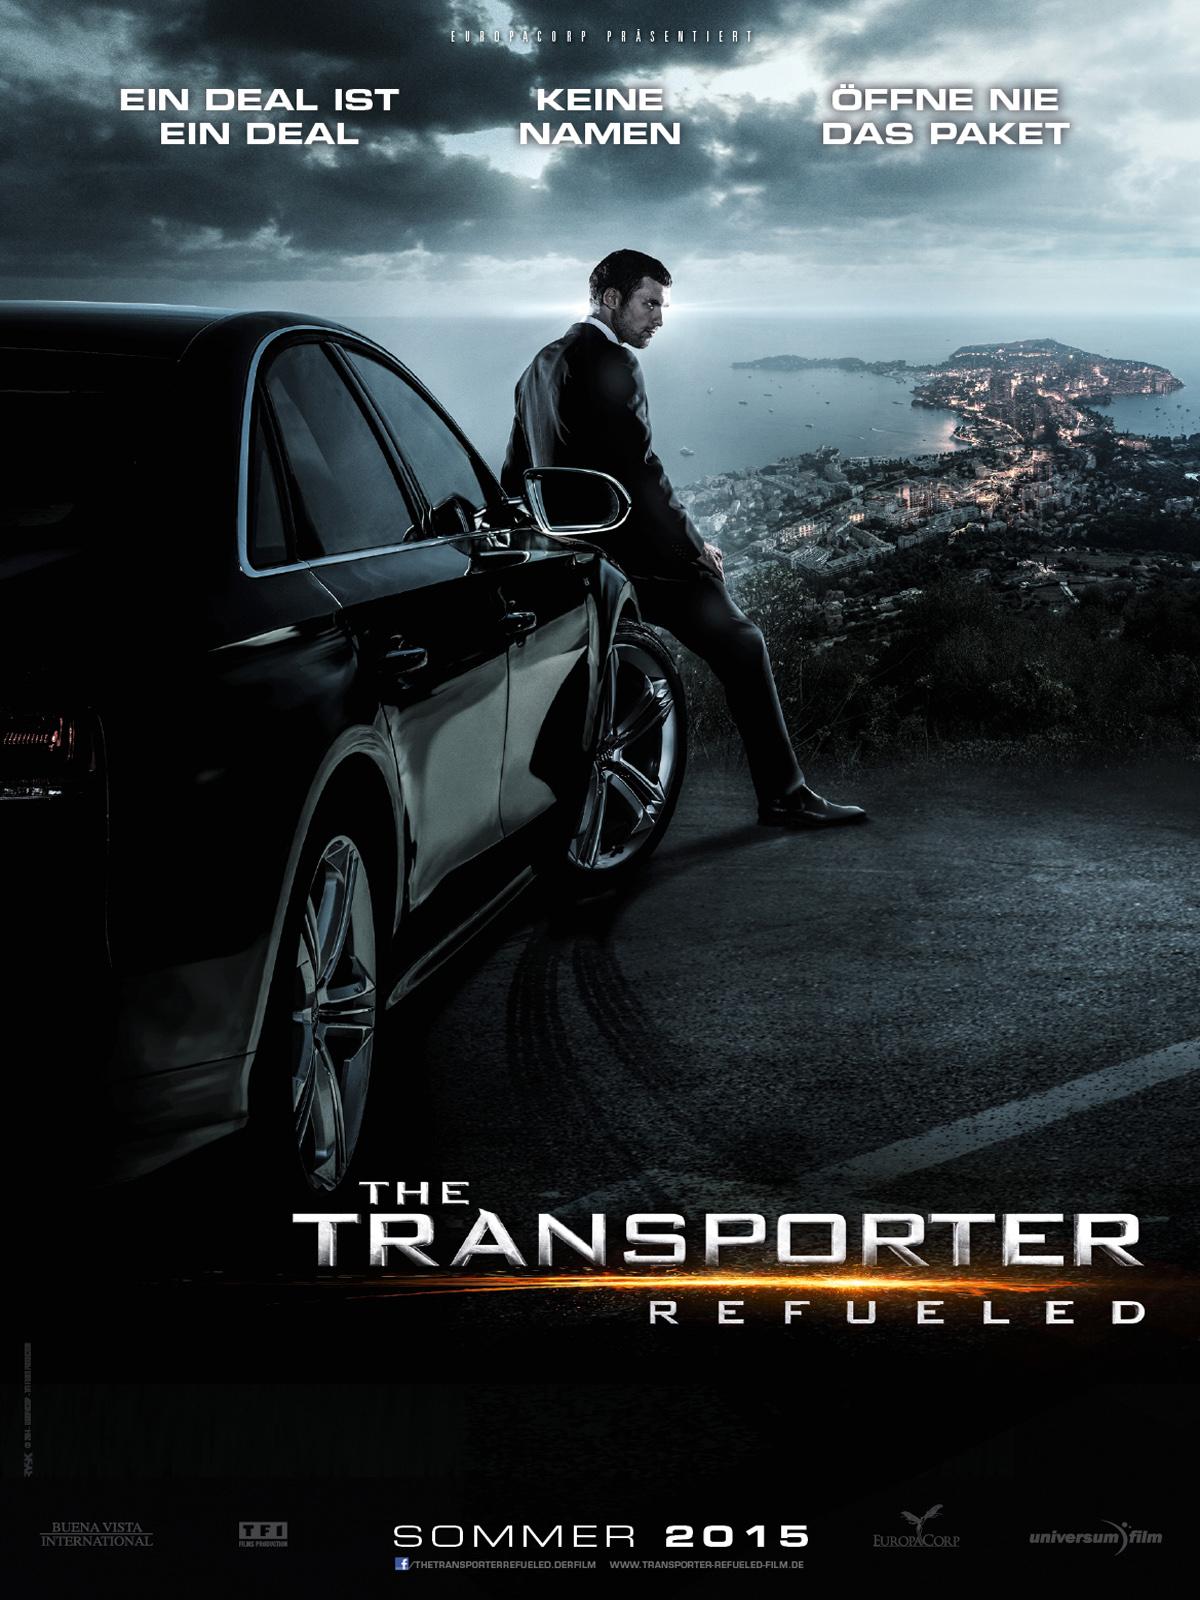 Poster Zum The Transporter Refueled Bild 4 Filmstarts De